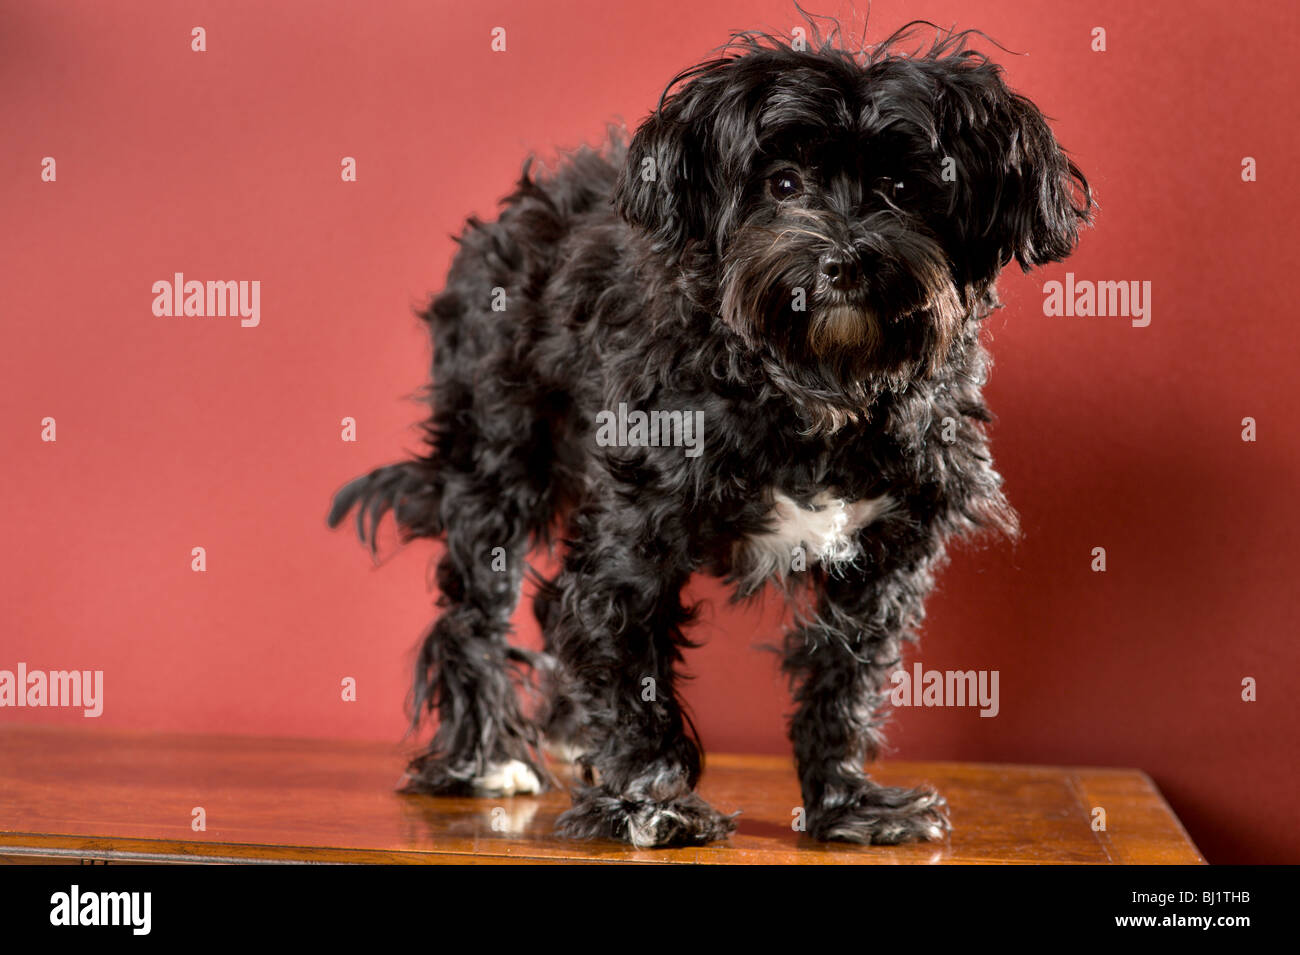 Full Length Portrait Of A Black Maltese Yorkie Mix Dog Standing